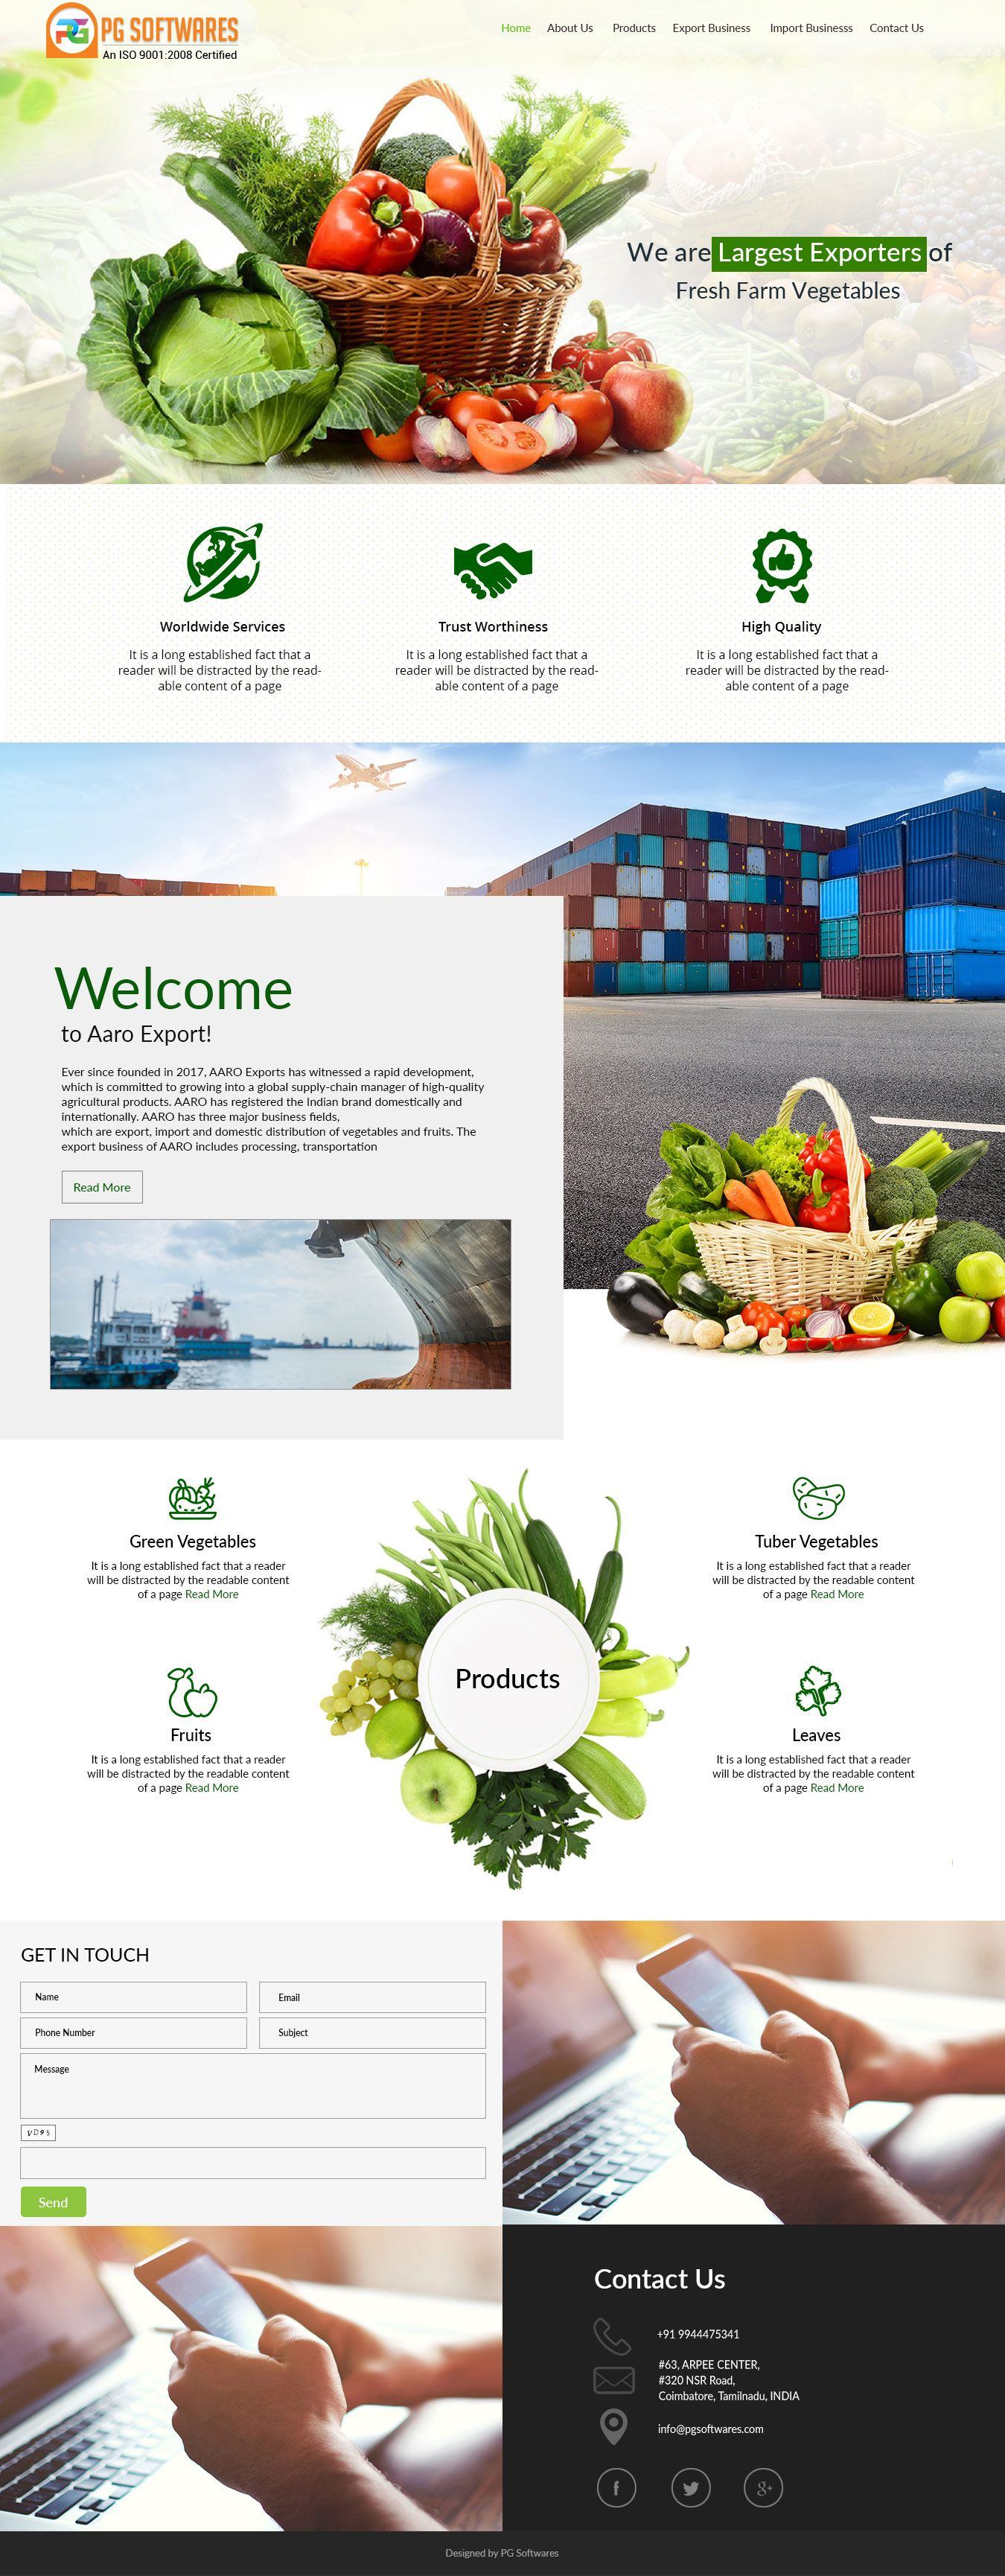 Vegtables & Fruits Export Business - Responsive Website Template ...